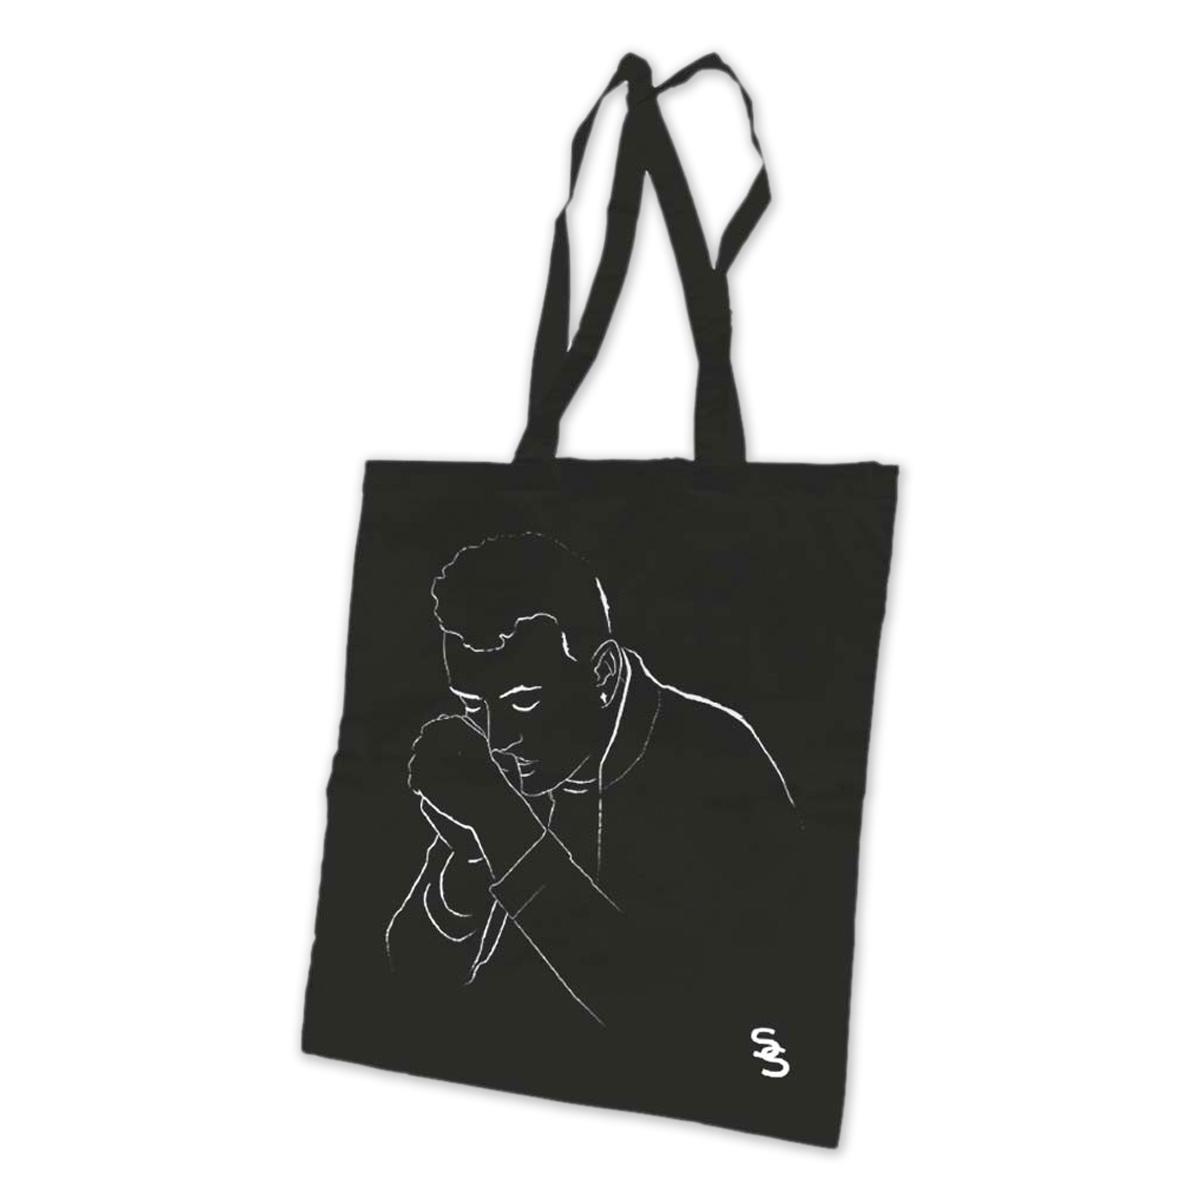 Sam Smith Portrait Tote Bag